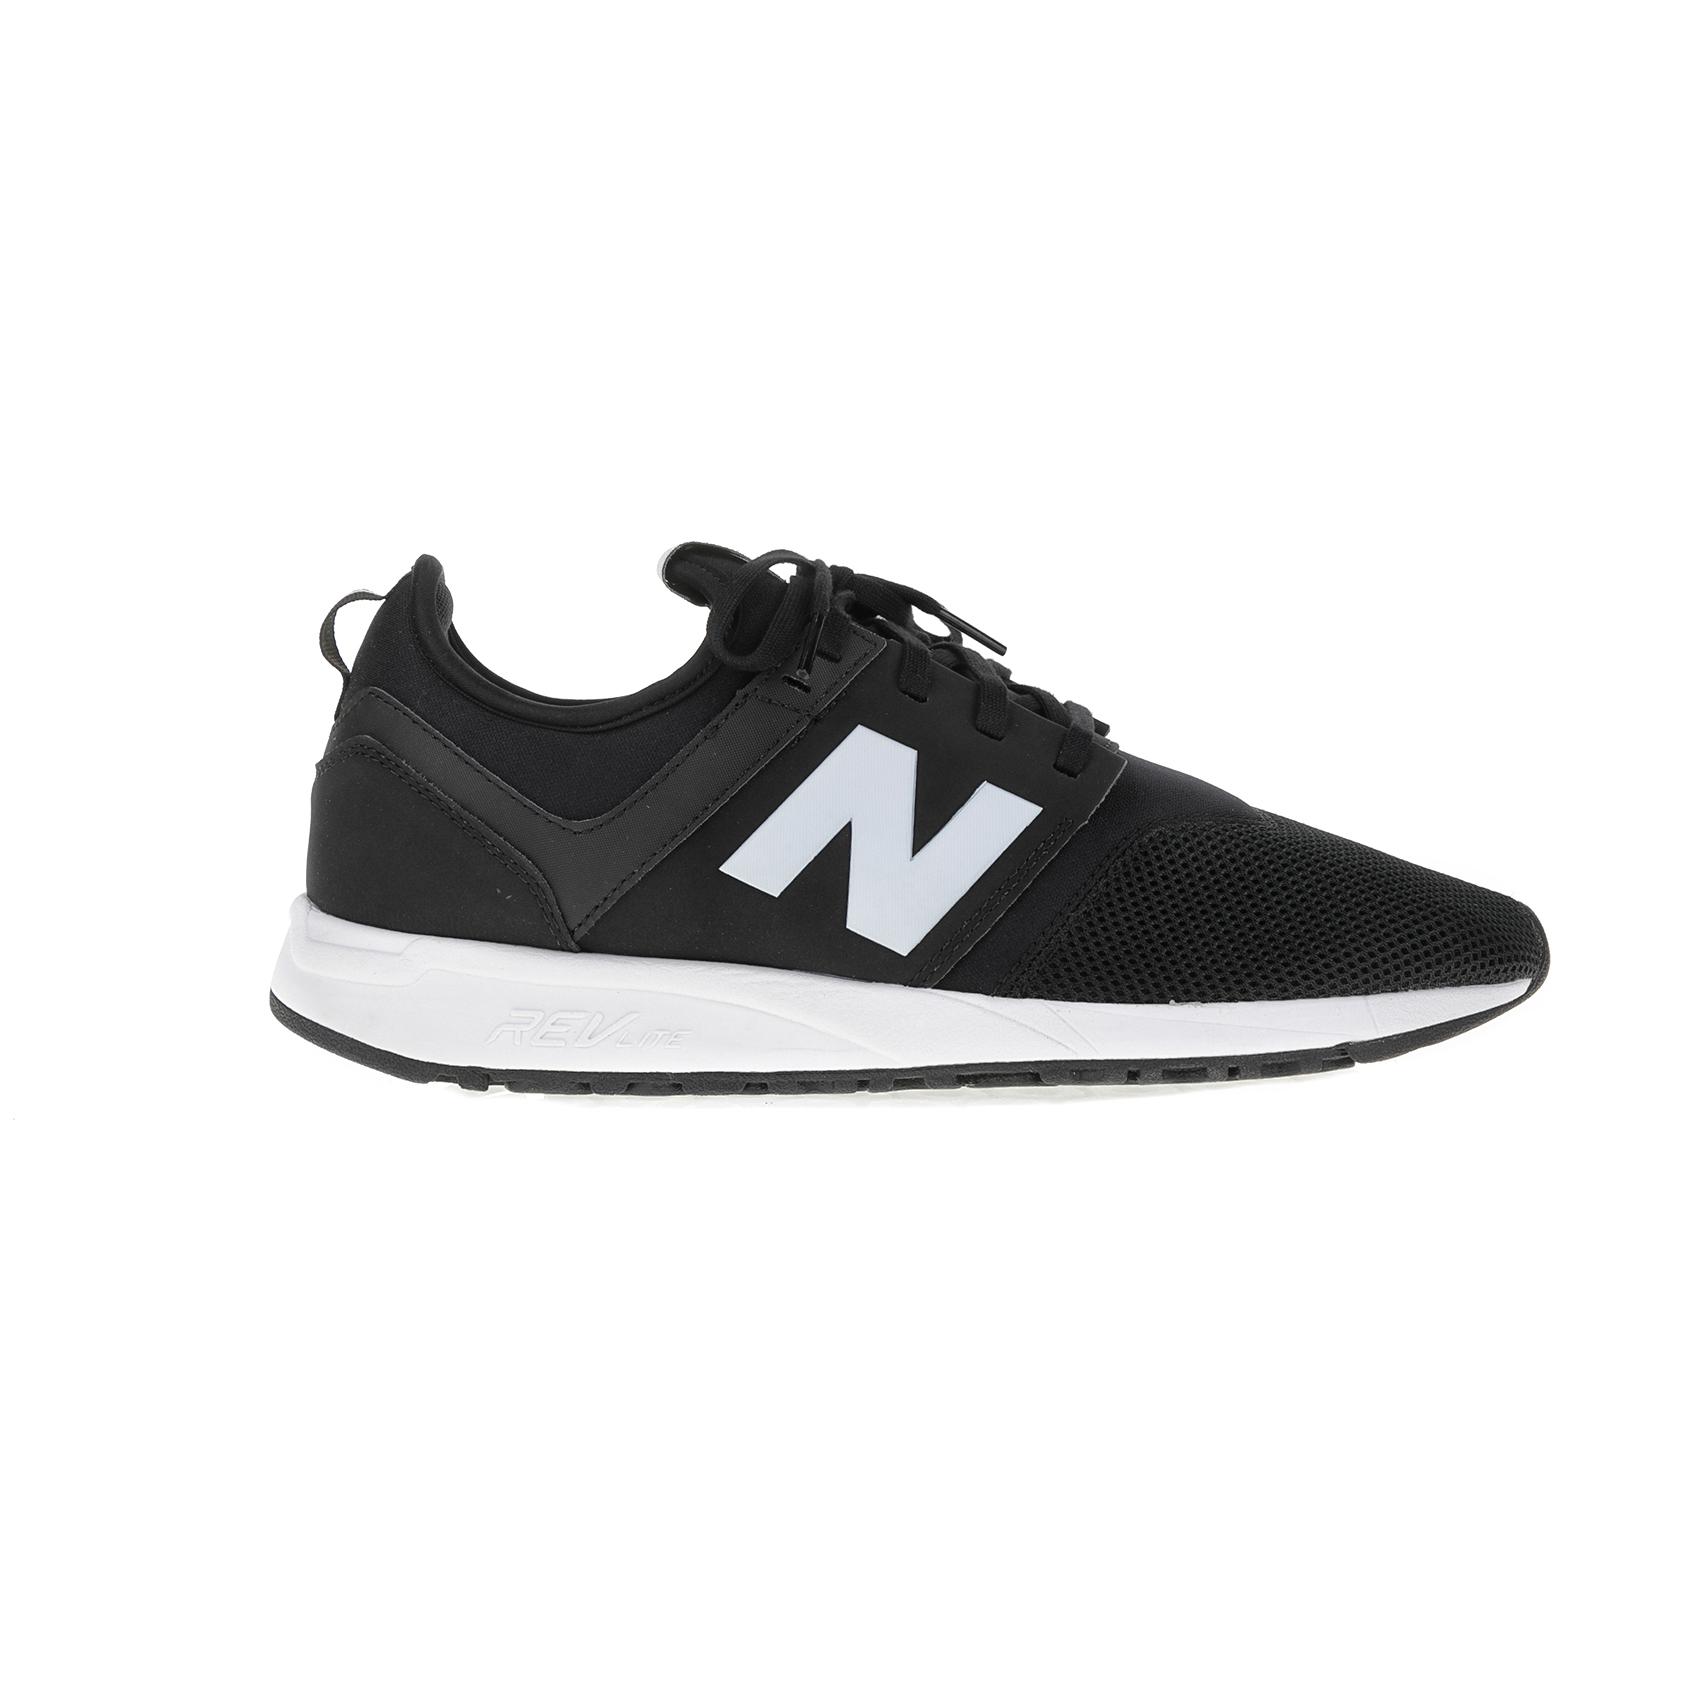 NEW BALANCE – Ανδρικά παπούτσια NEW BALANCE MRL247BG μαύρα